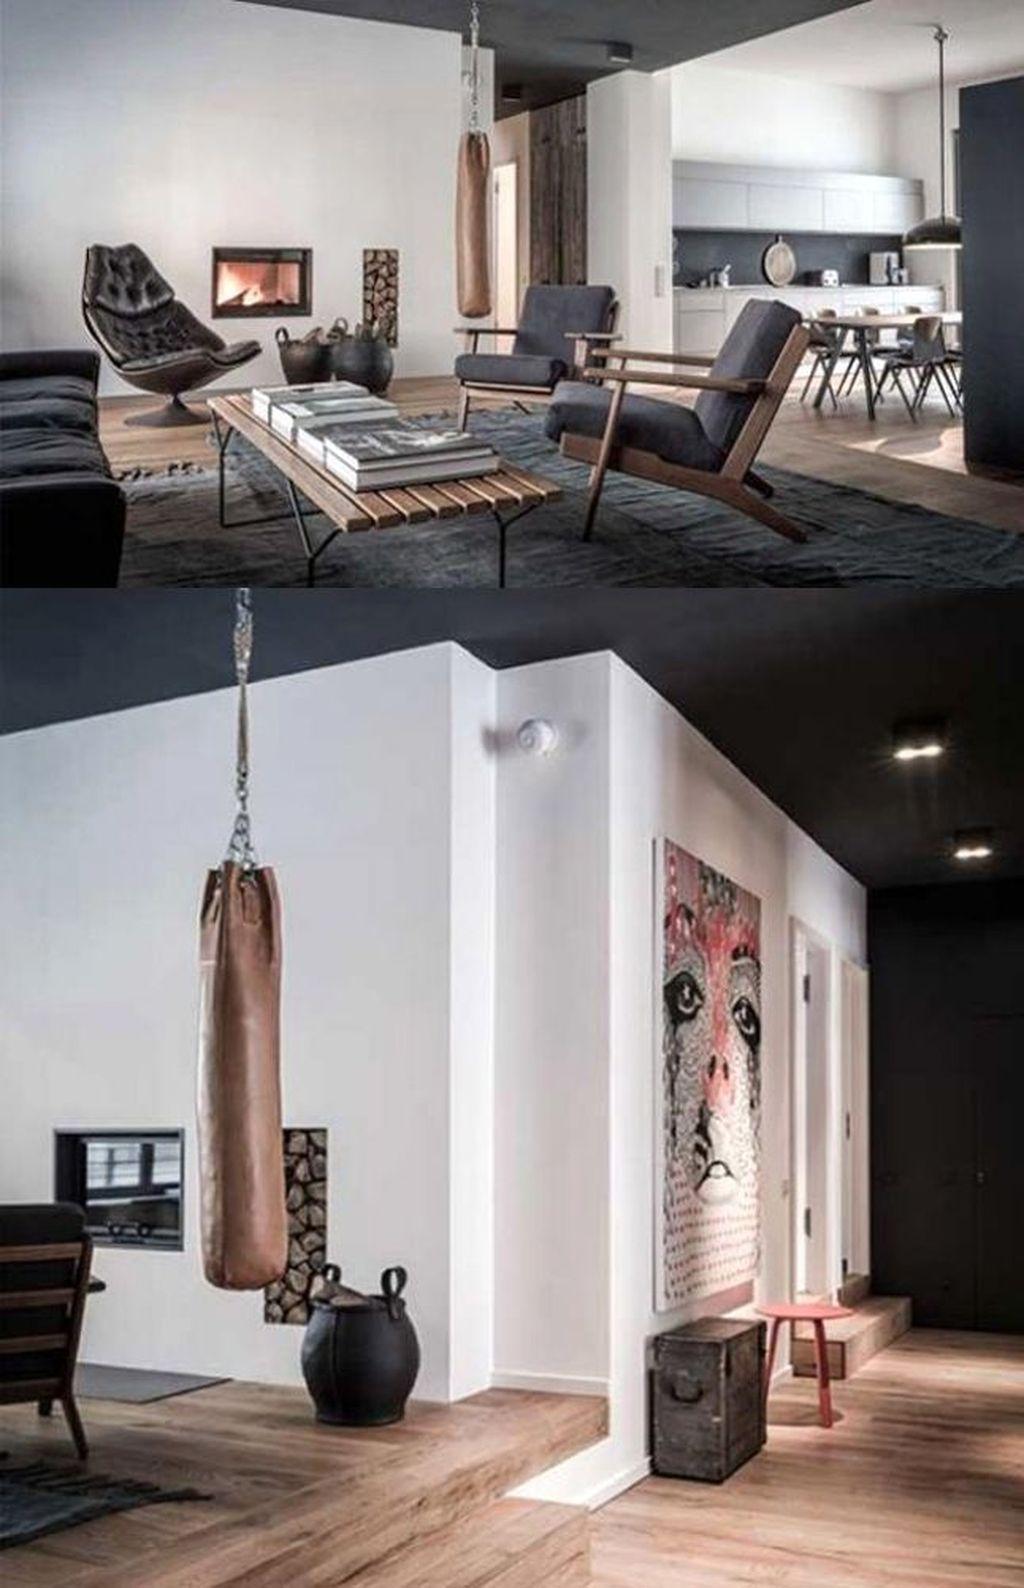 Living Room Apartment Men 46 Masculine Apartment Decorating Ideas For Men Livingroom Apartme Apartment Interior Apartment Interior Design Apartment Room